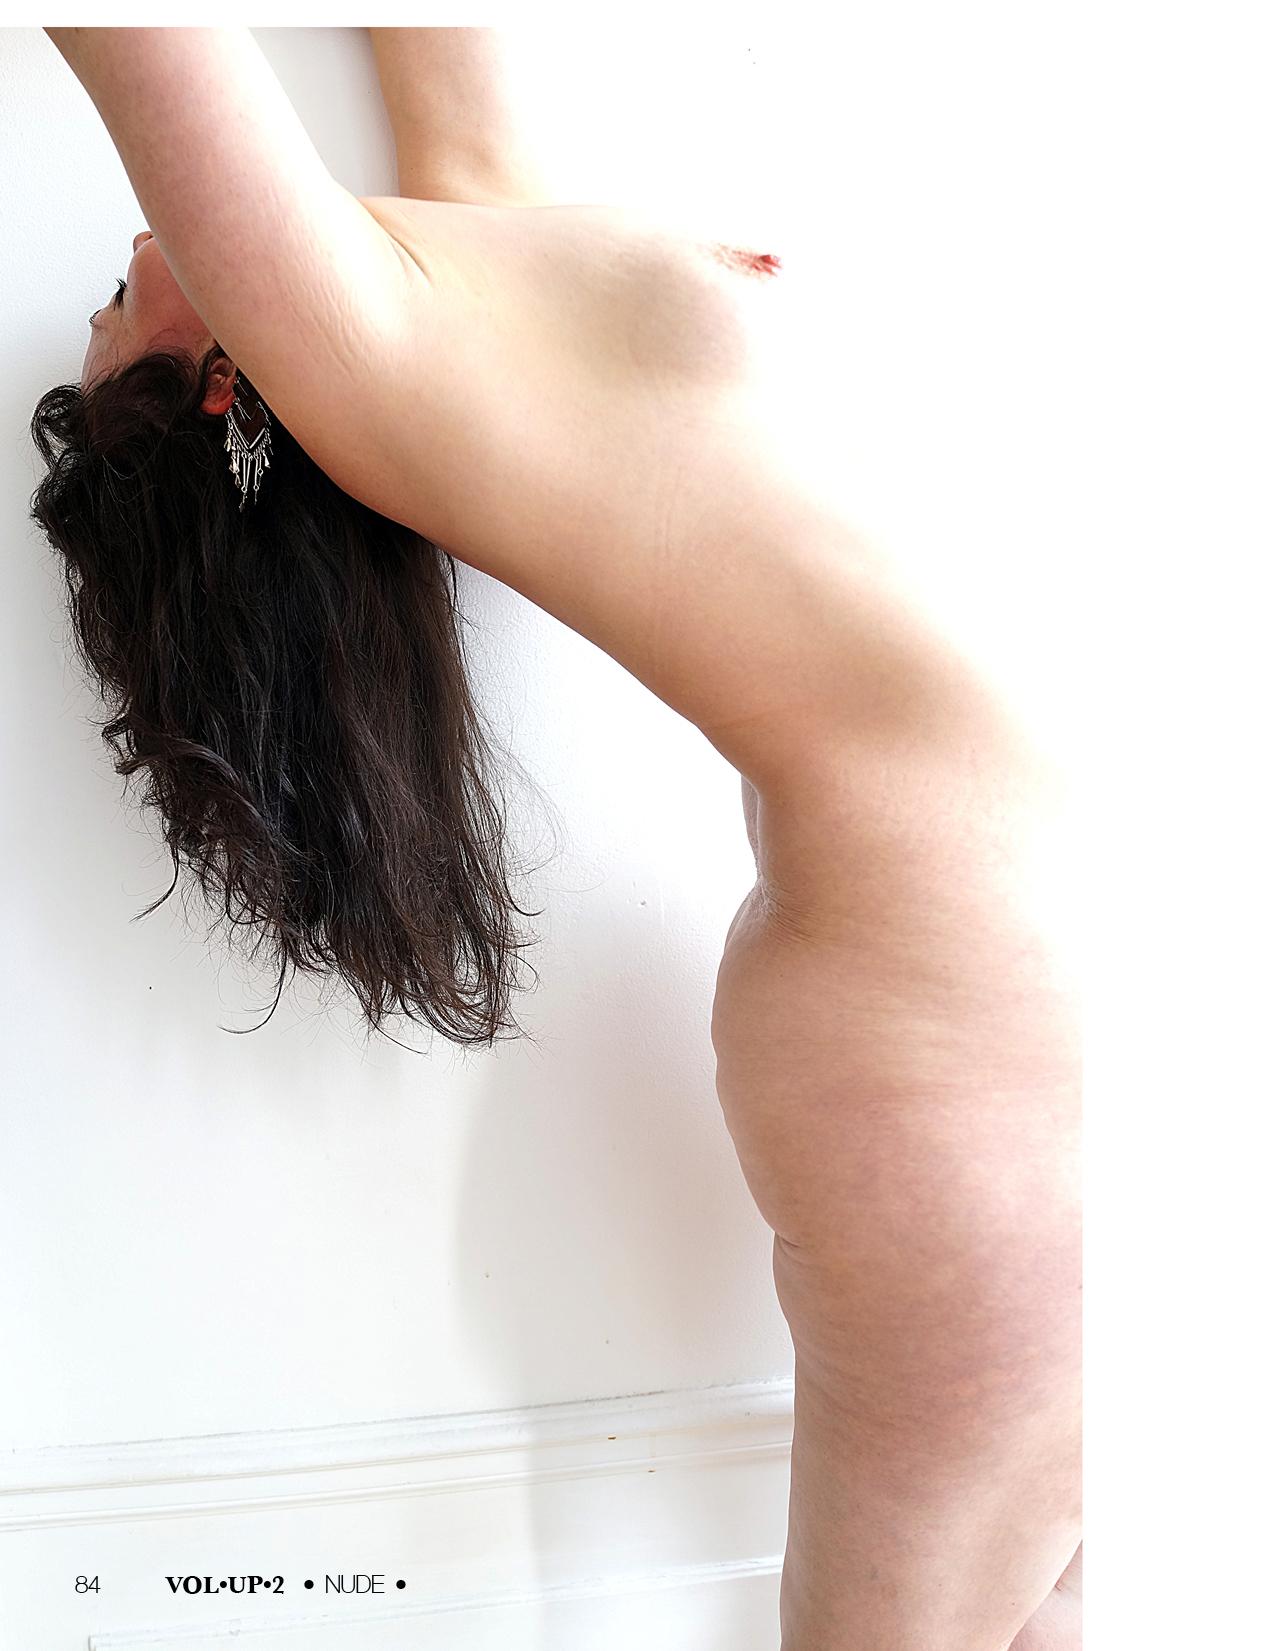 volup2-nude-whole-FINAL84.jpg